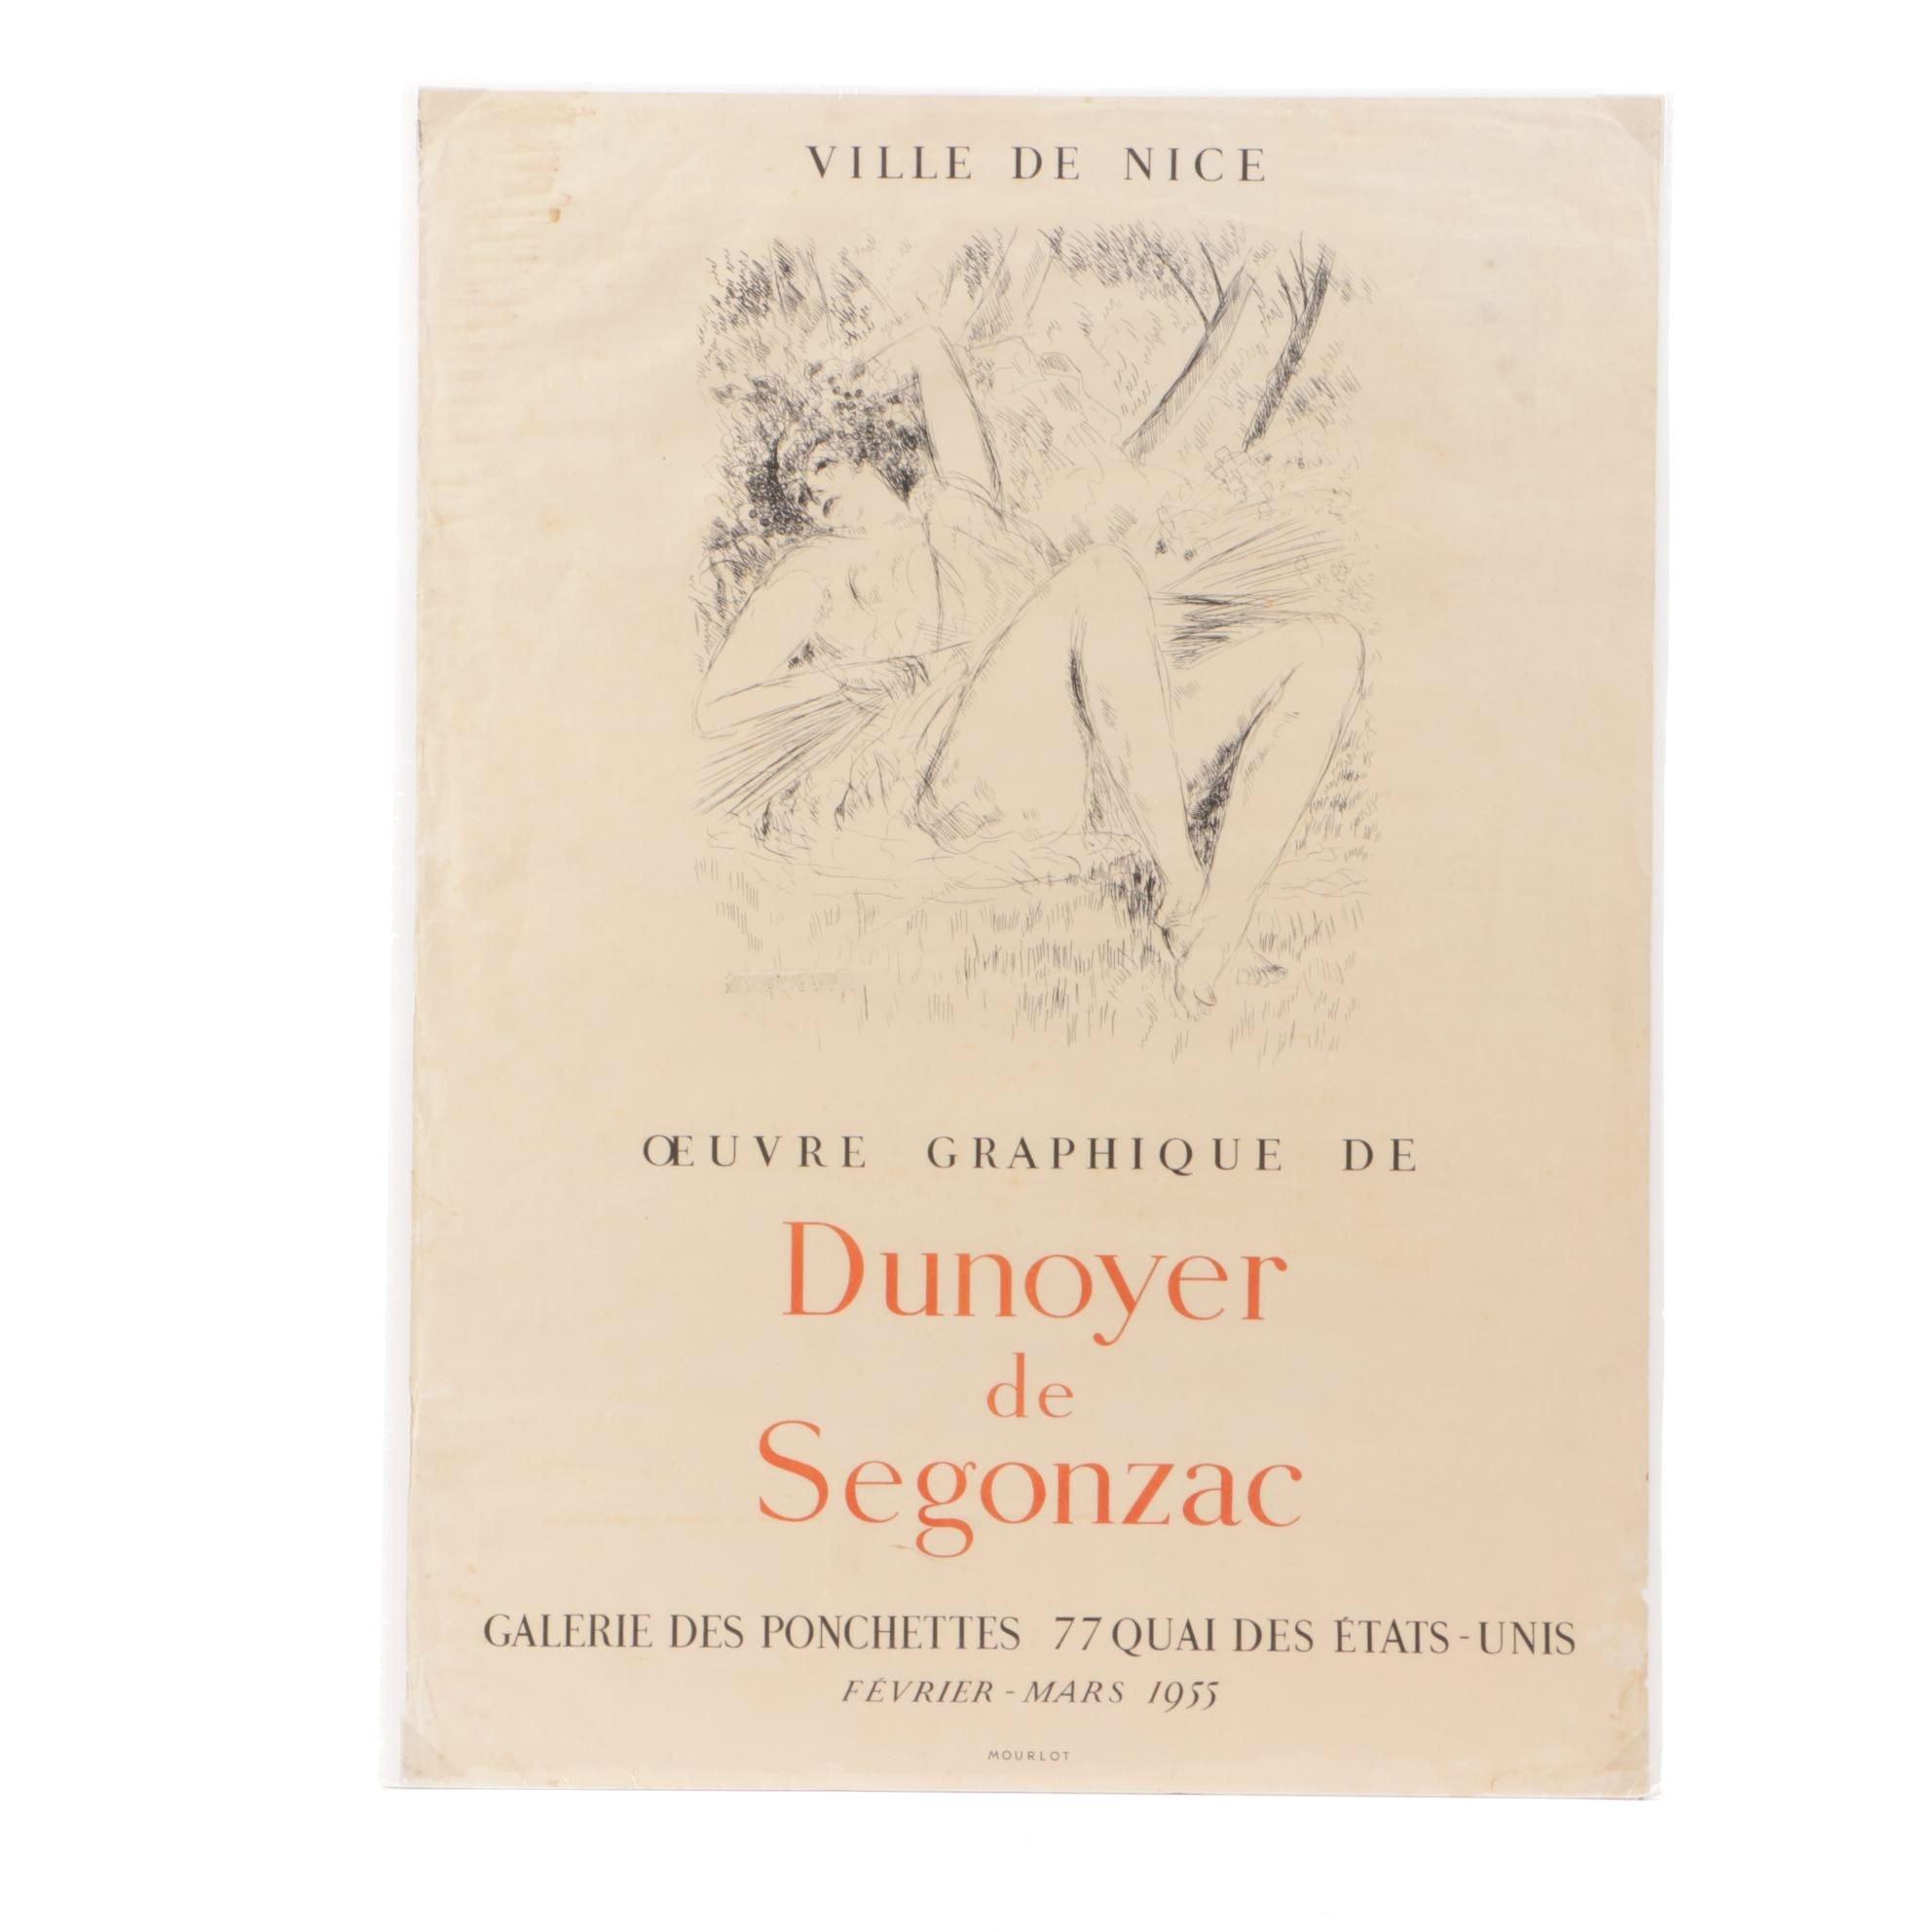 1955 Mourlot Lithograph Exhibition Poster after Andre Dunoyer de Segonzac